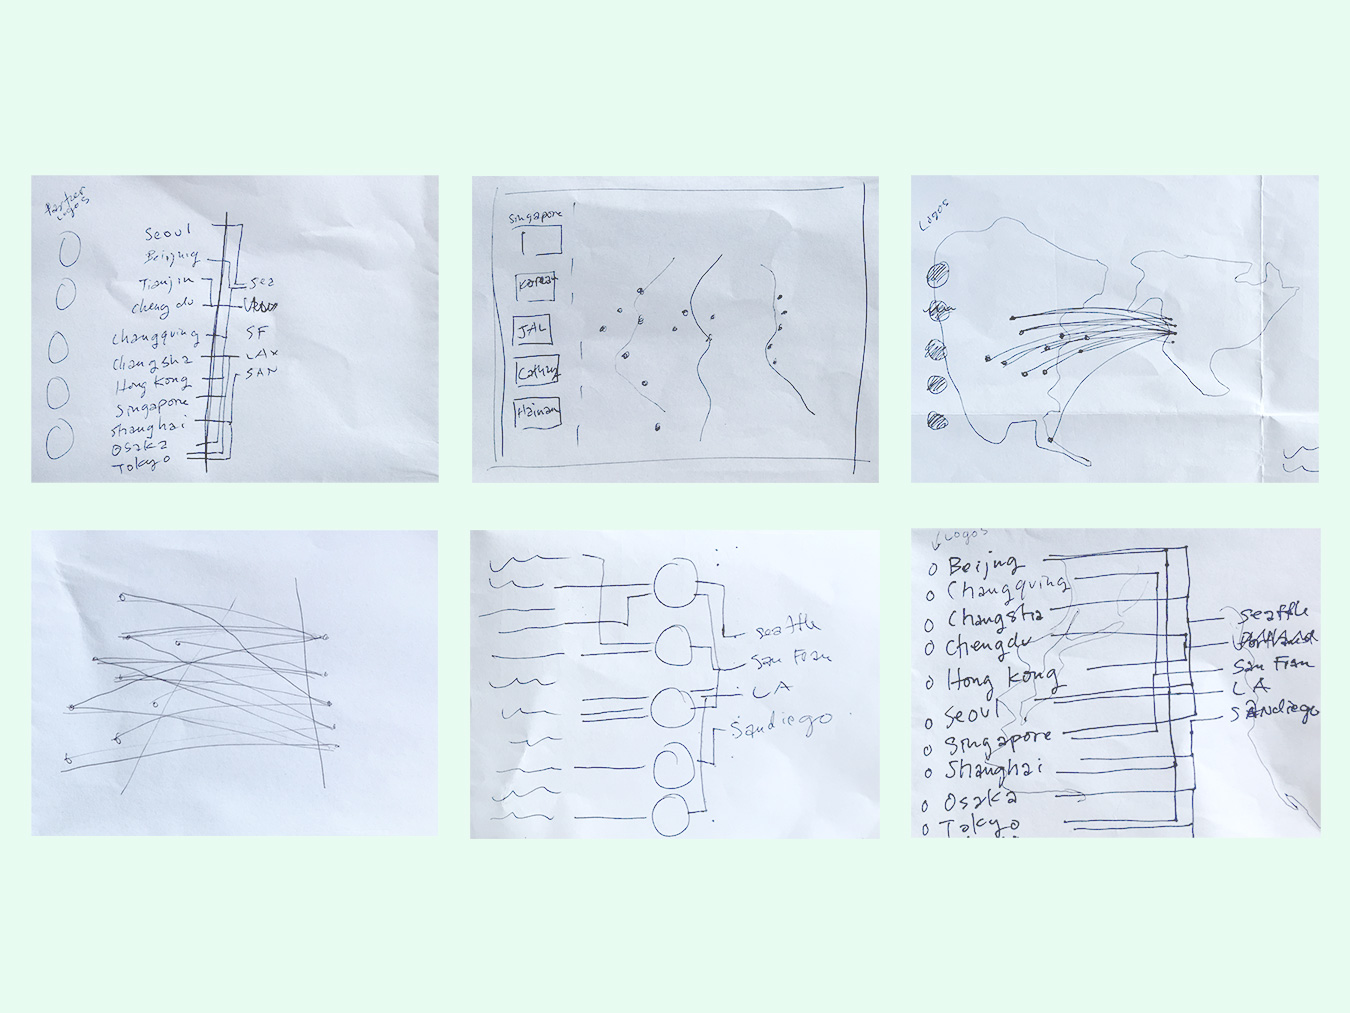 asia-partner-map-sketches.jpg